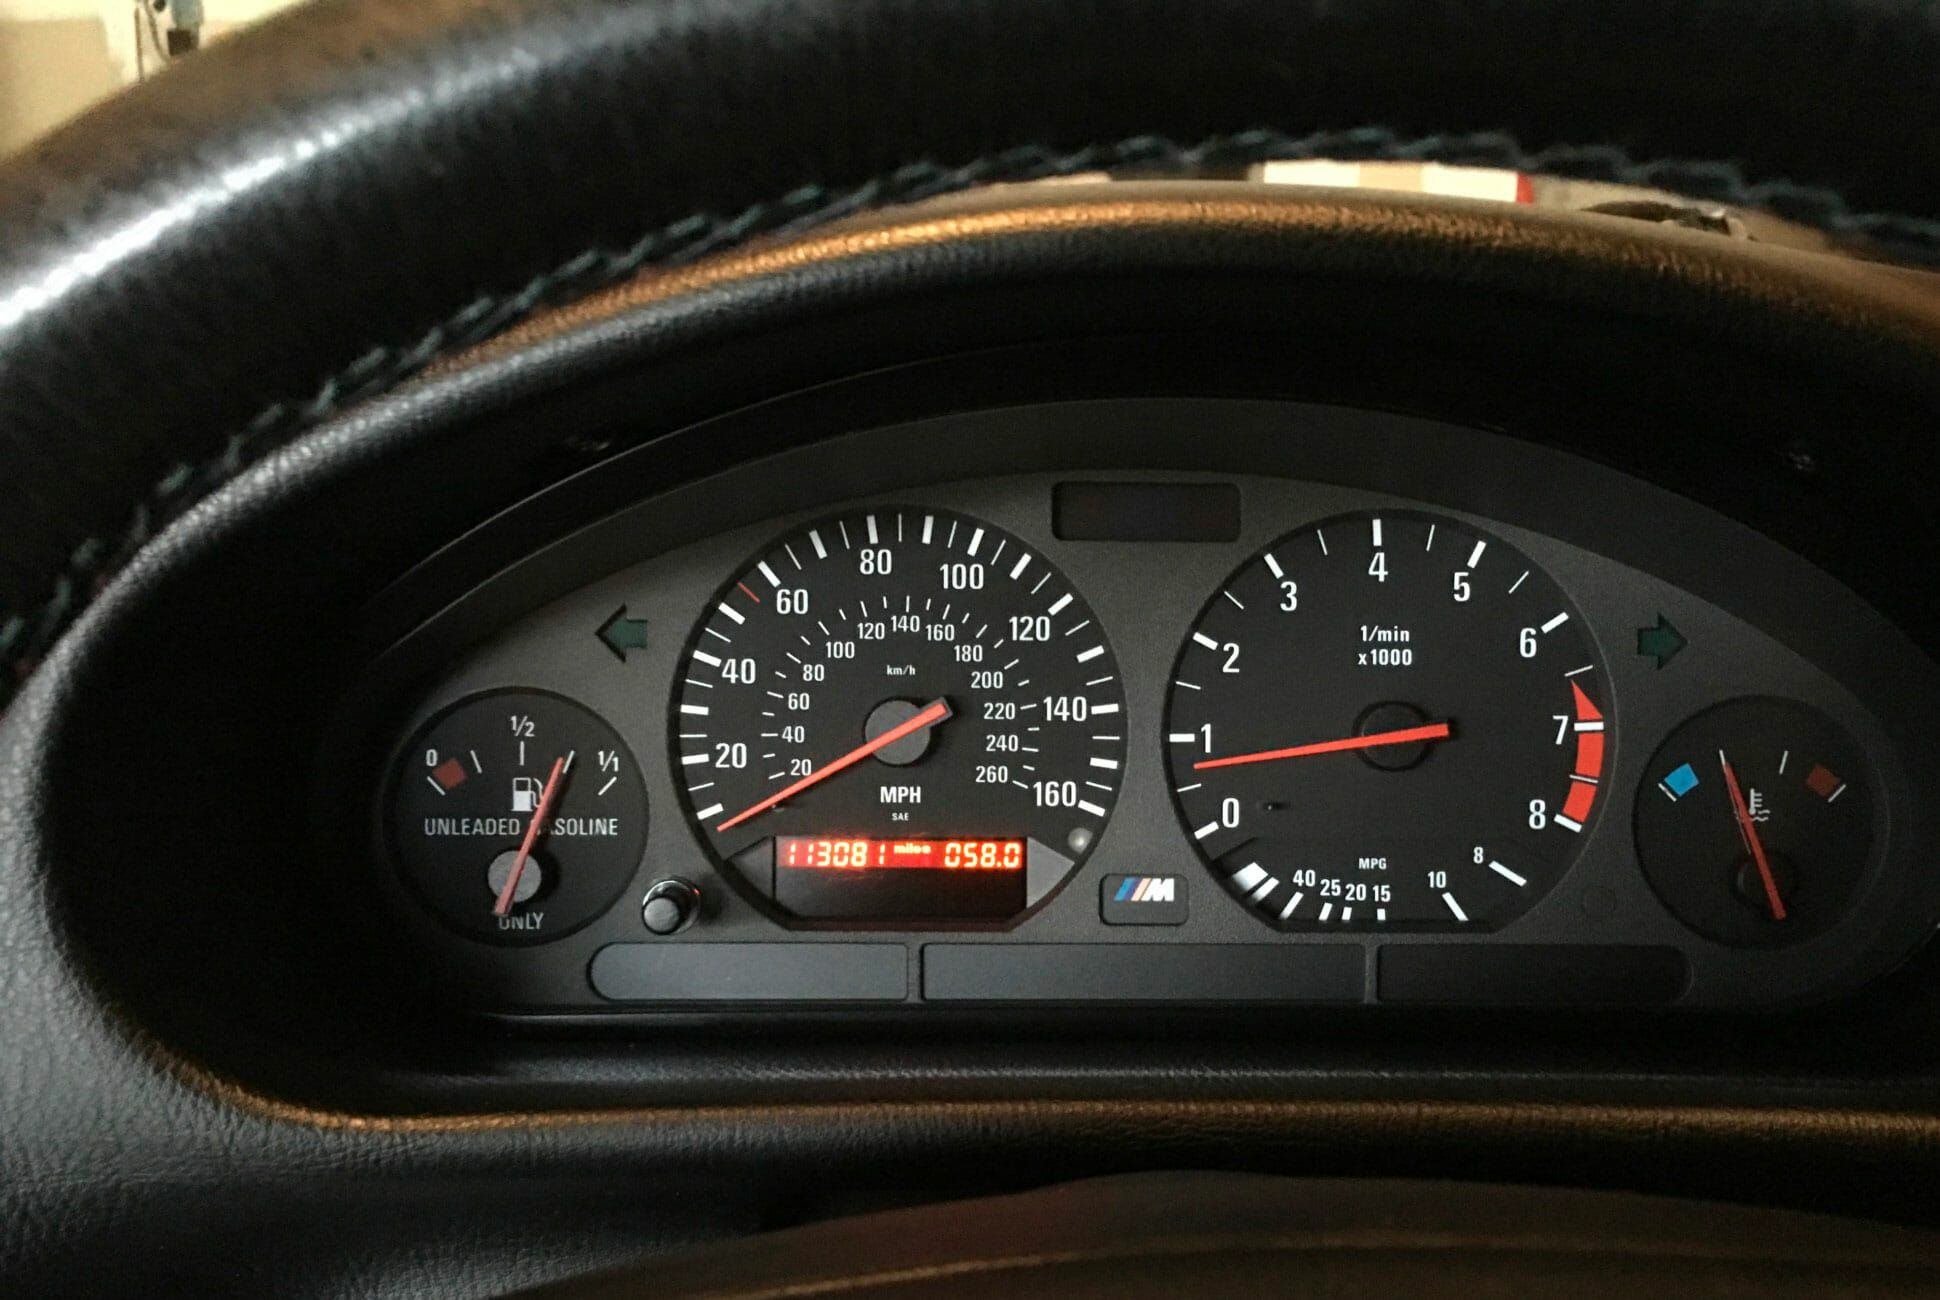 1996-BMW-M3-Coupe-5-Speed-gear-patrol-slide-04